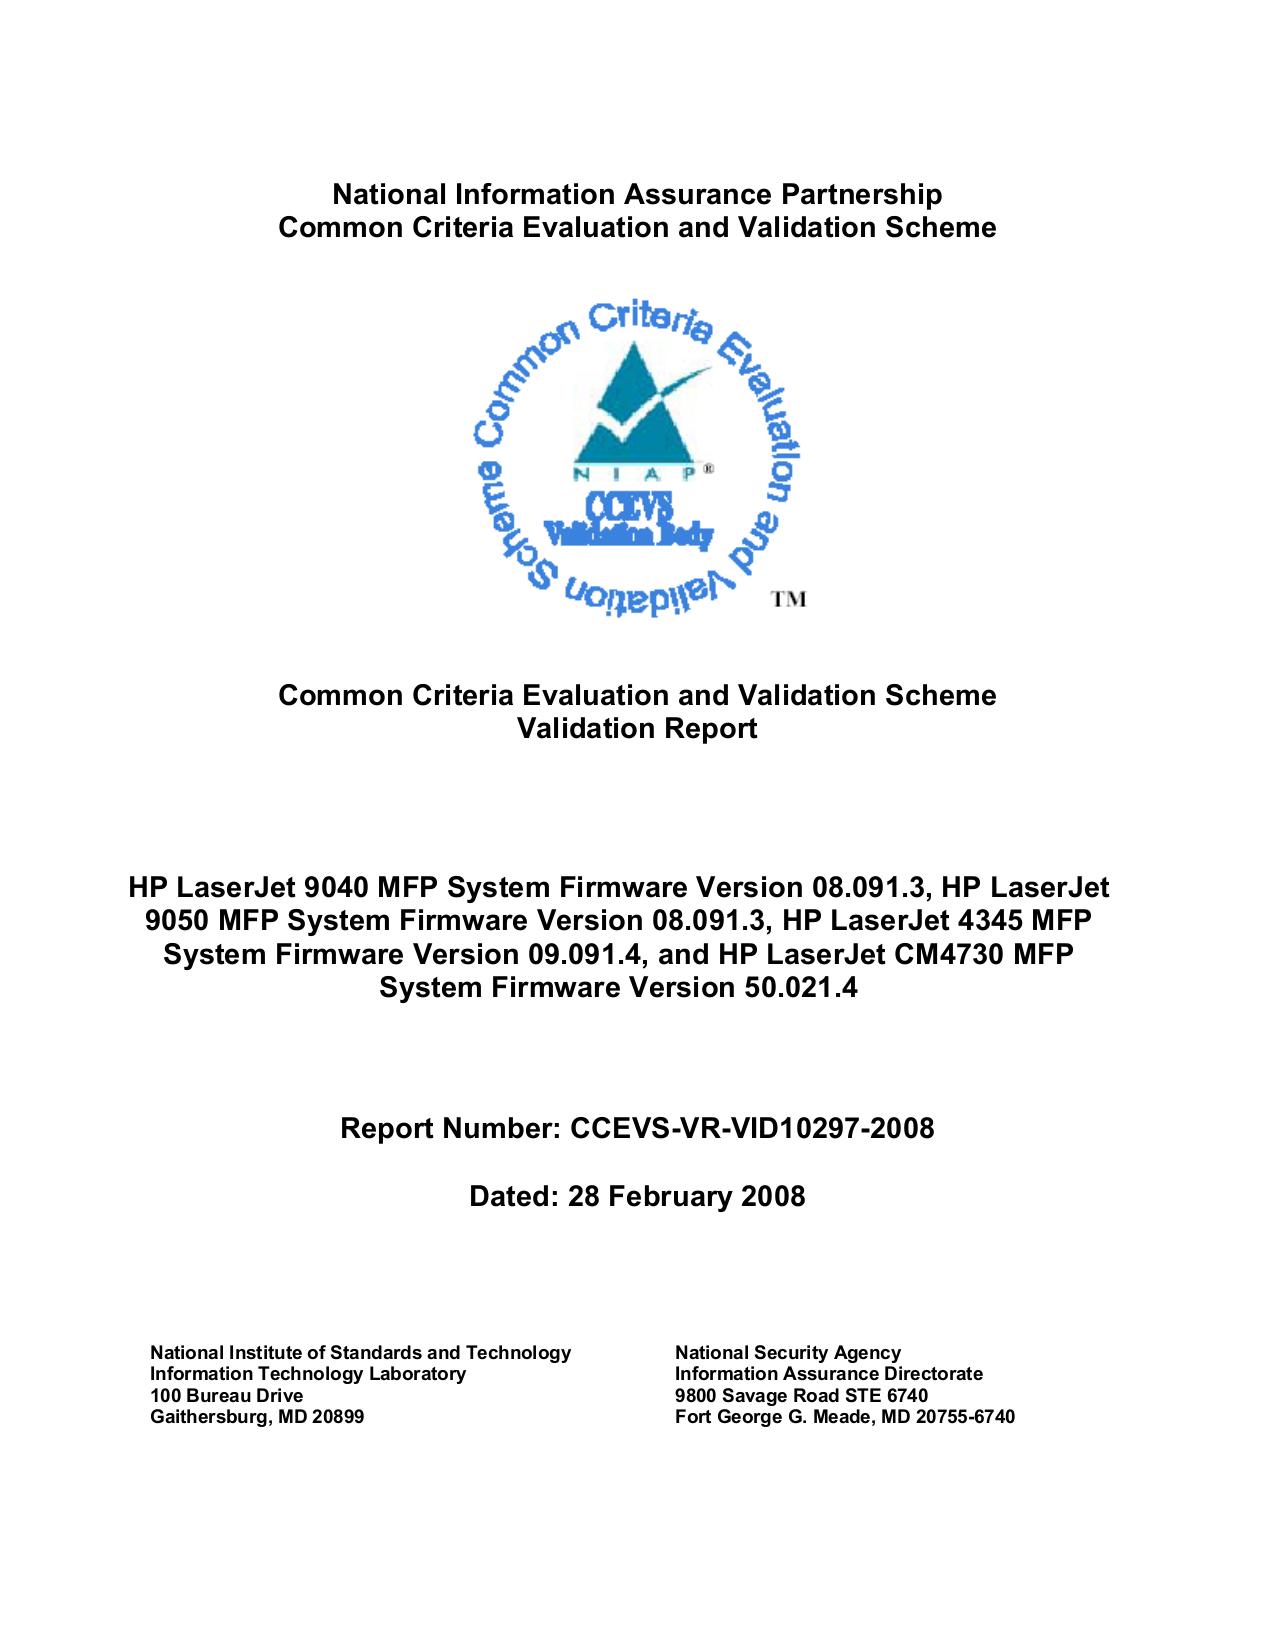 Cm4730 mfp manual ebook manual civil engineer array download free pdf for hp laserjetcolor laserjet 4345xs mfp rh umlib com fandeluxe Image collections